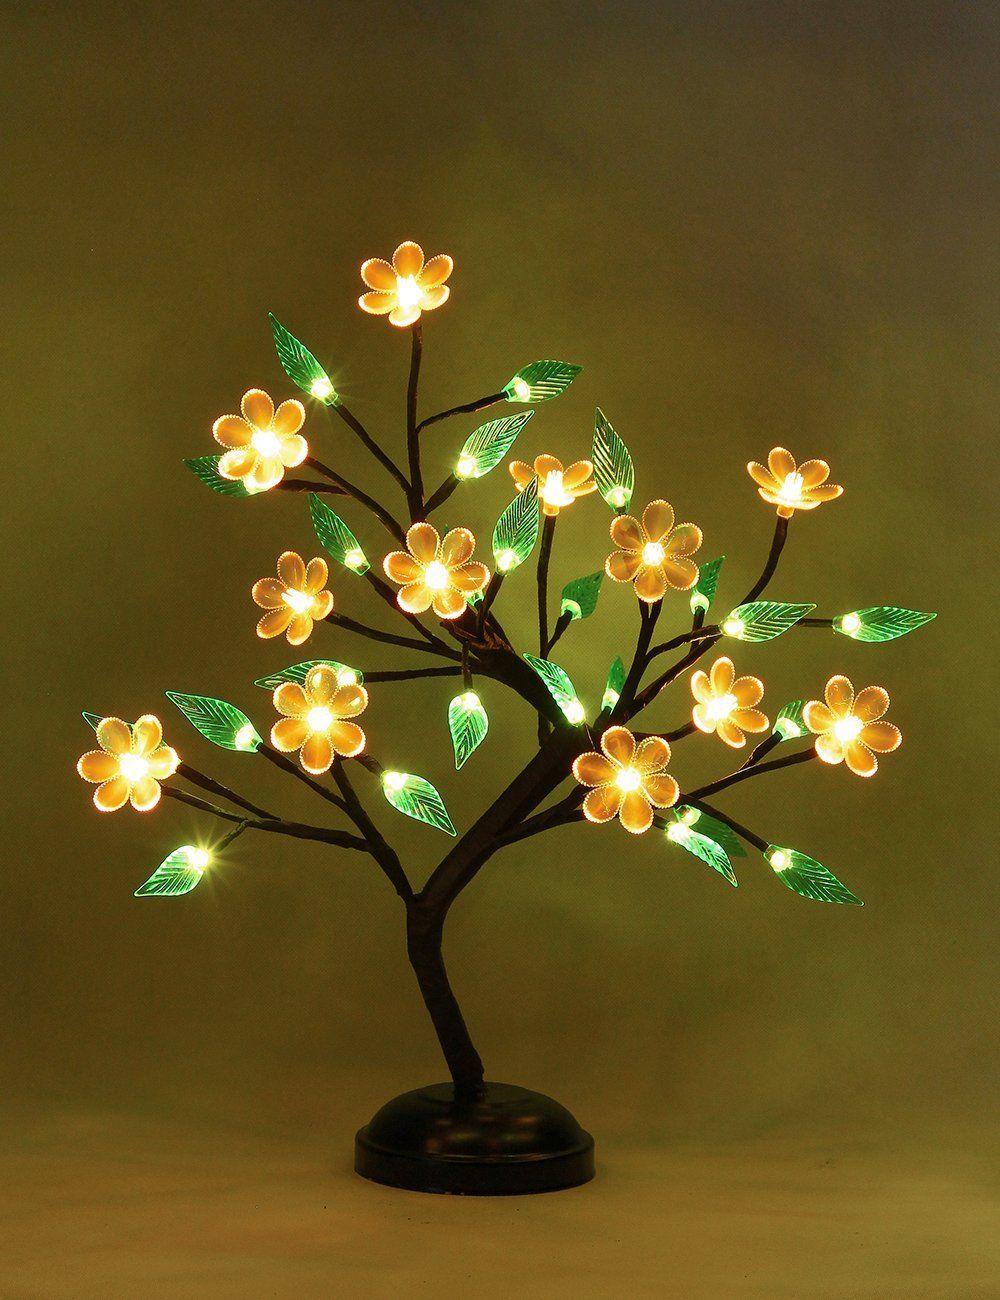 New Bonsai Light With Pink Flower Paper Flower Centerpieces Flowers Diwali Decoration Items